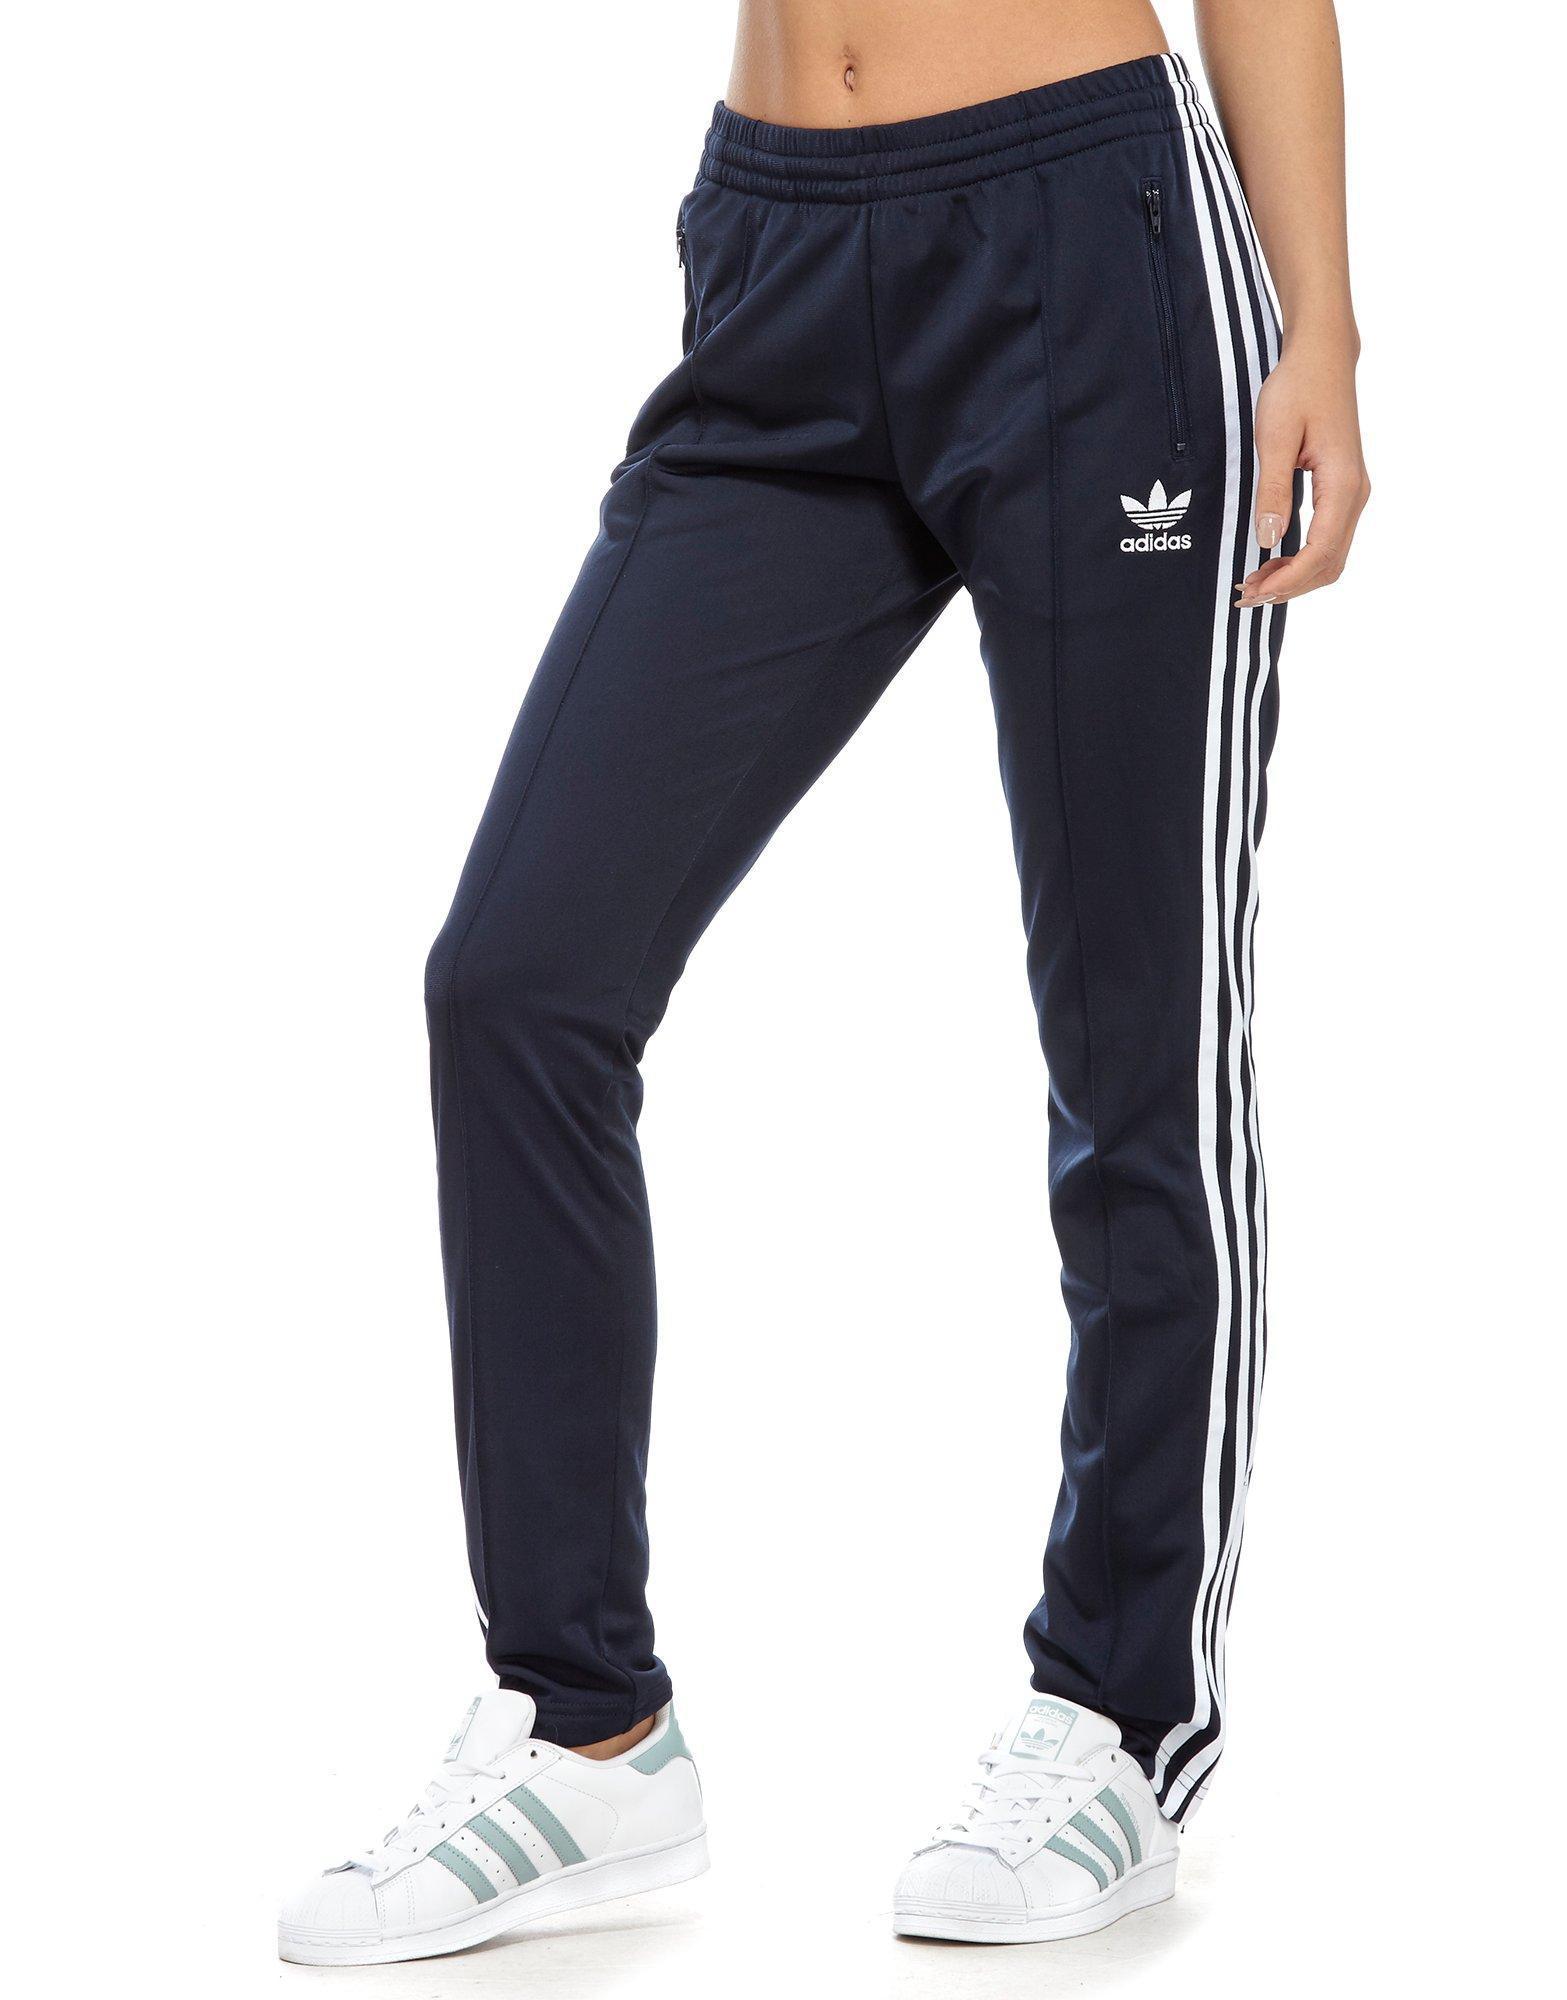 online store ef5dd b5765 adidas Originals Firebird Track Pants in Blue - Lyst